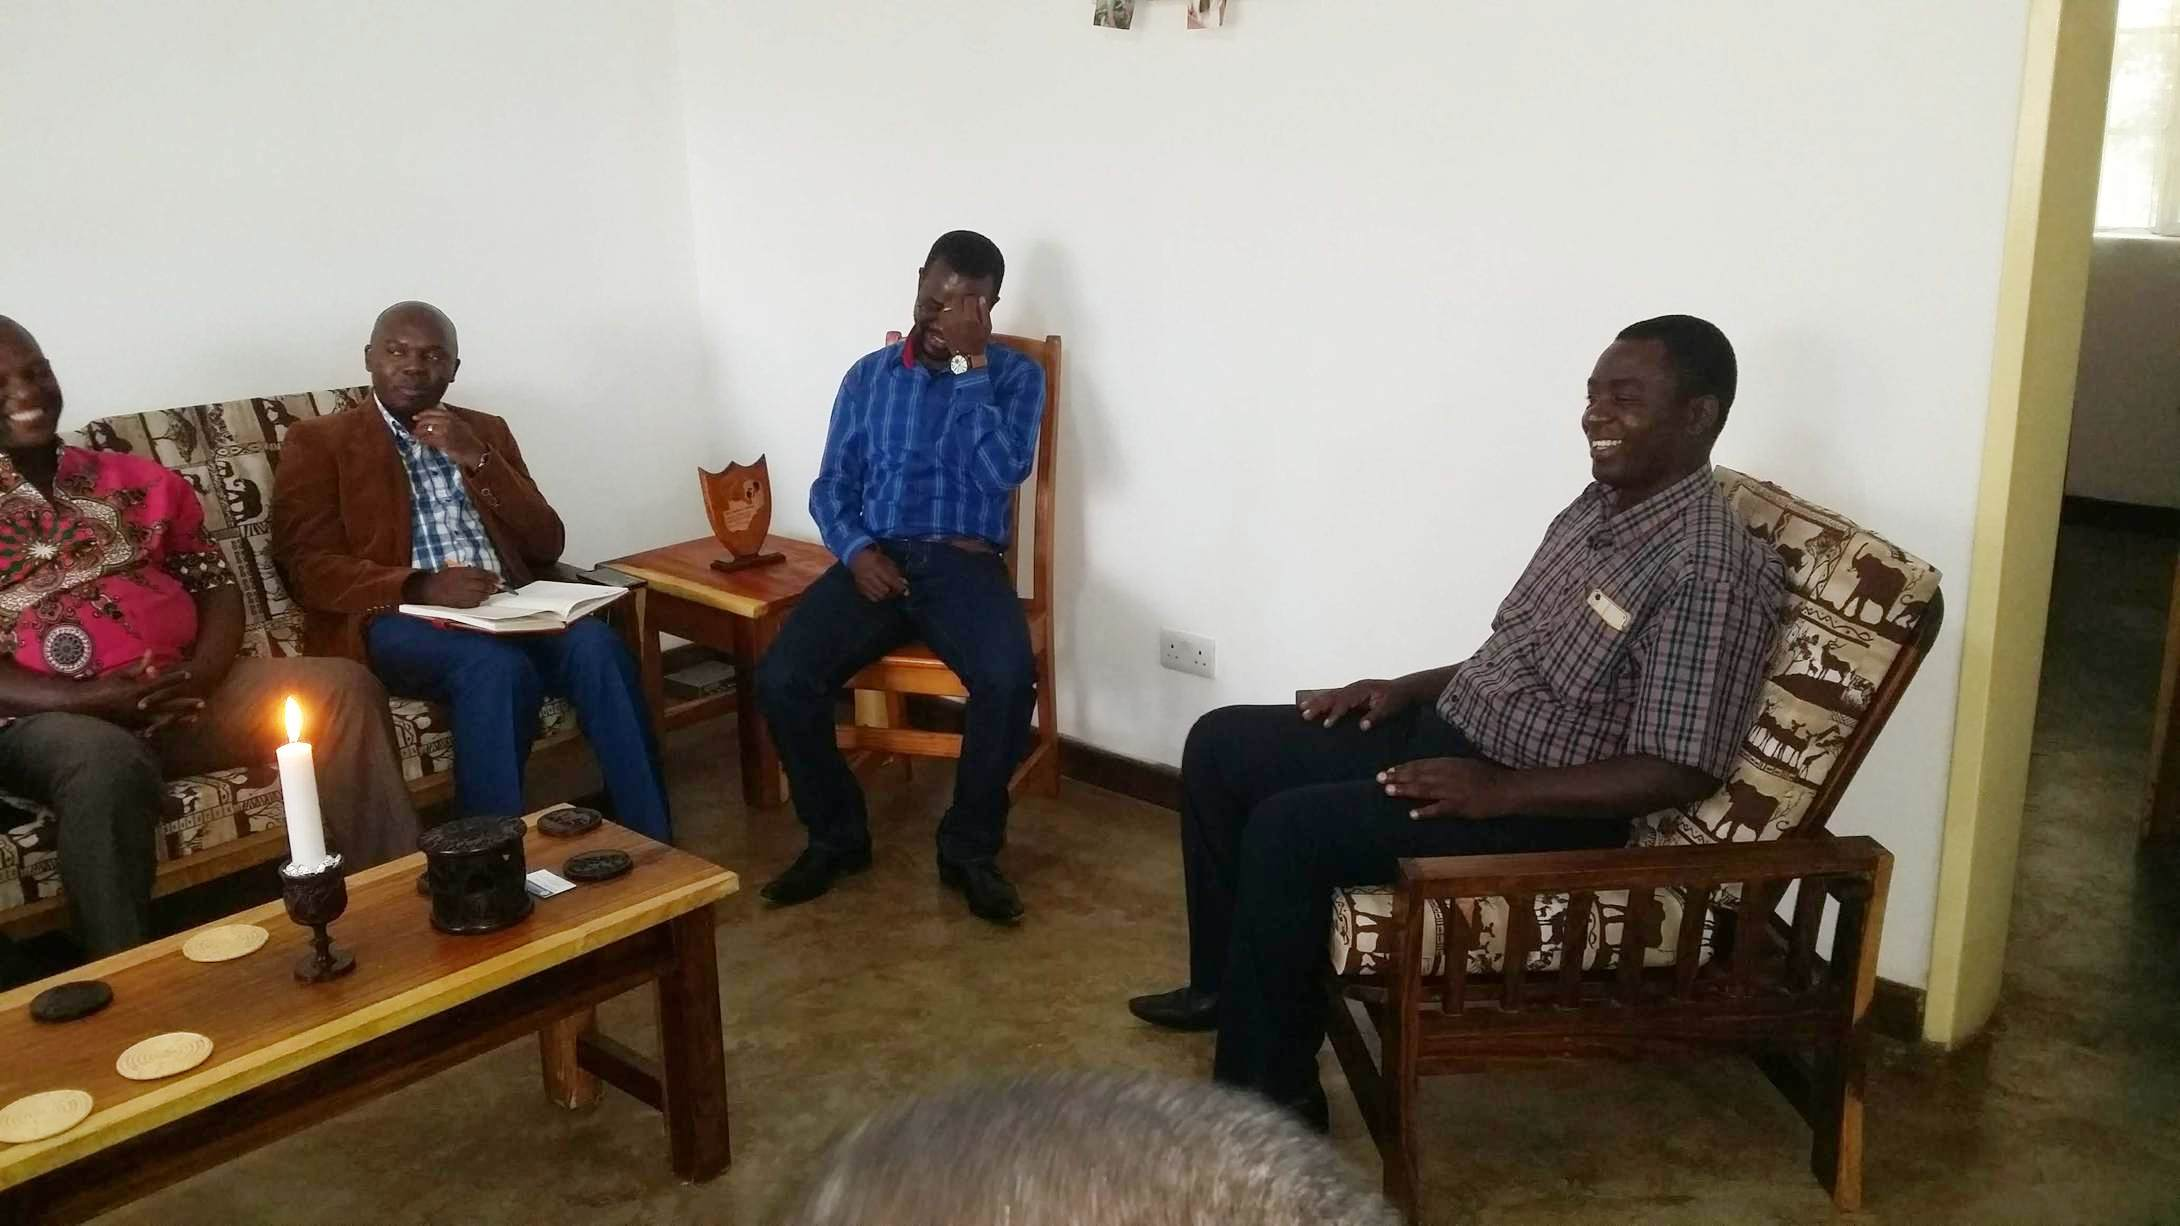 (from left to right): UPCSA's Reverends Sauros Phaika; Richard M'Kandawire; Kennedy Mhoni; Edward Chirwa, Mchinga Presbytery's moderator.